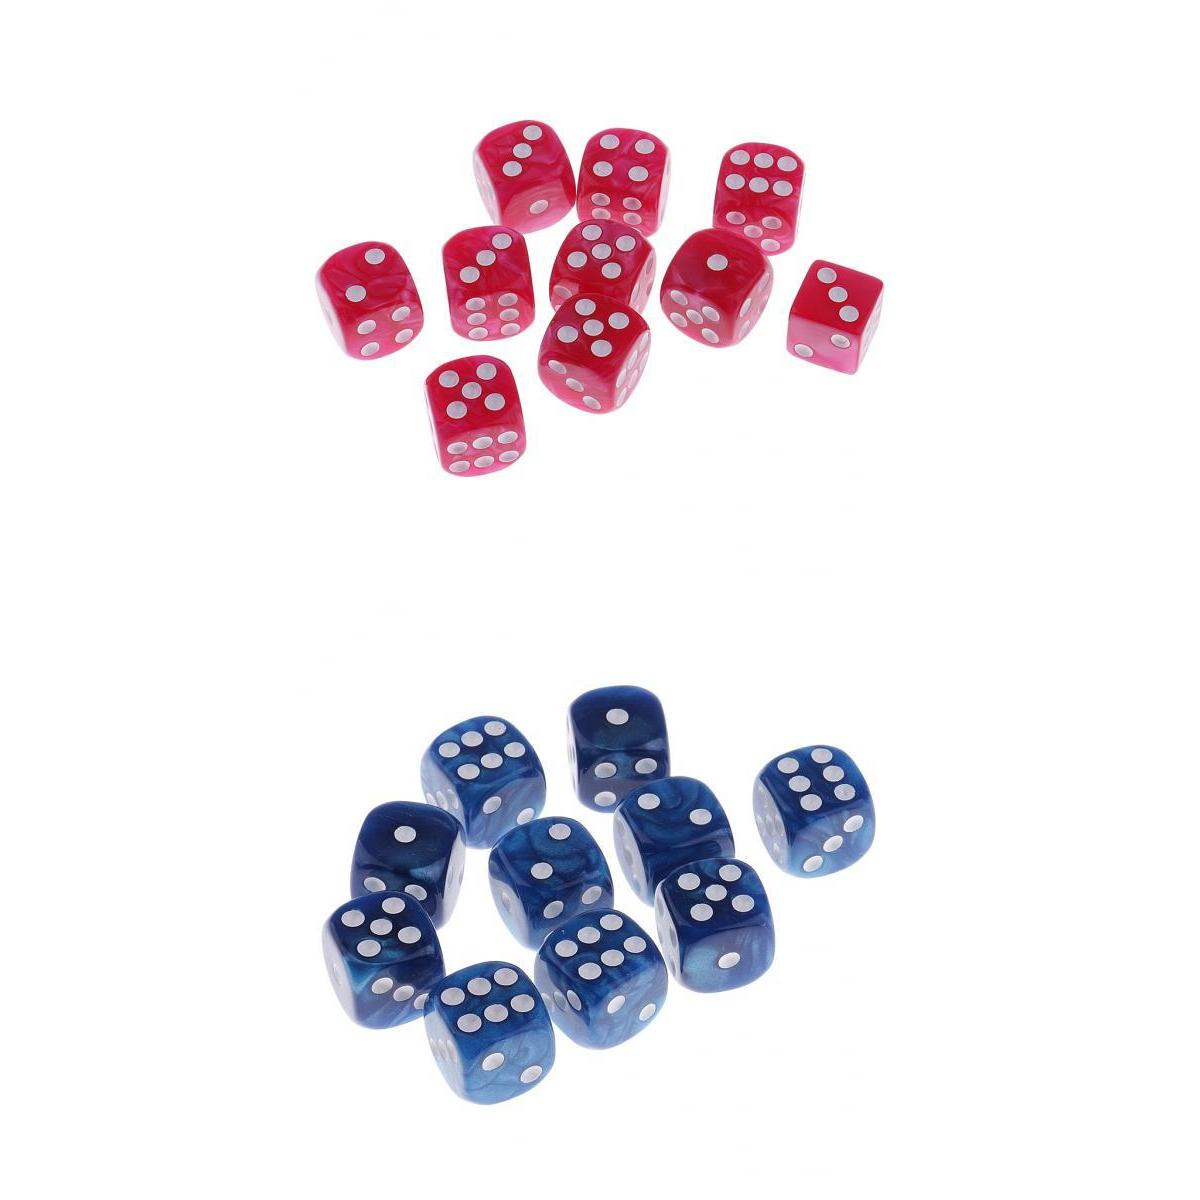 20pcs Plastic Spot Dice D6 Pink+Blue for Dungeons & Dragons Games Parts 16mm